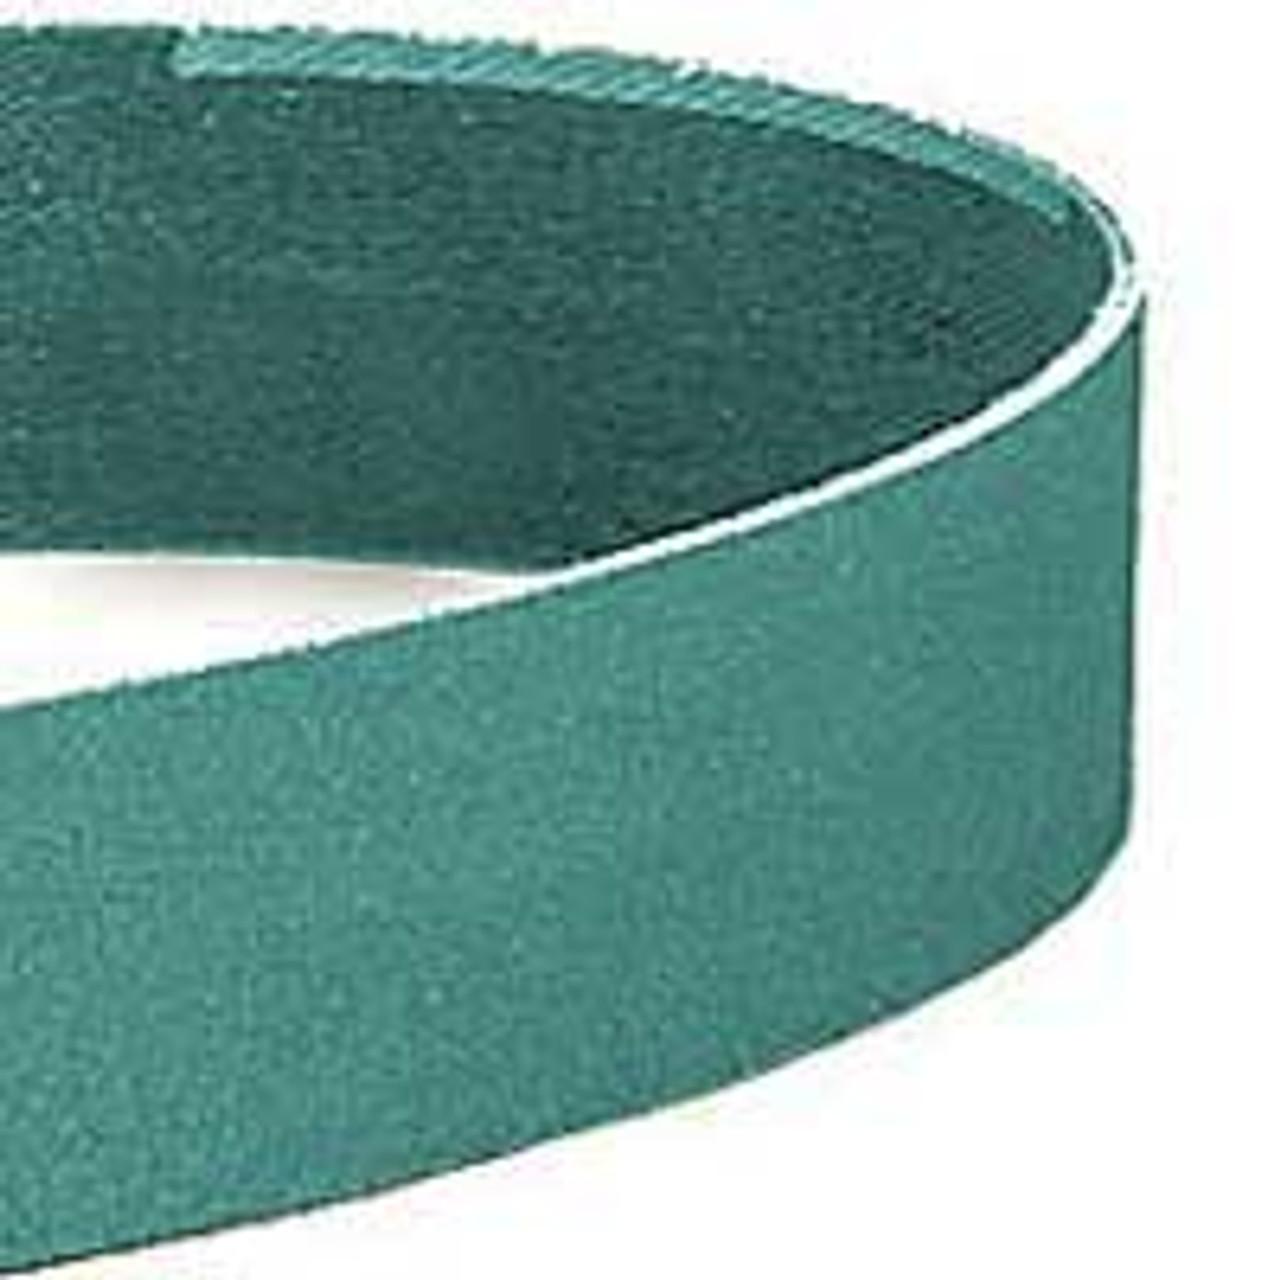 "Dynabrade 90360 - 2"" (51 mm) W x 34"" (864 mm) L 36 Grit Z/A DynaCut Belt (Qty 10)"